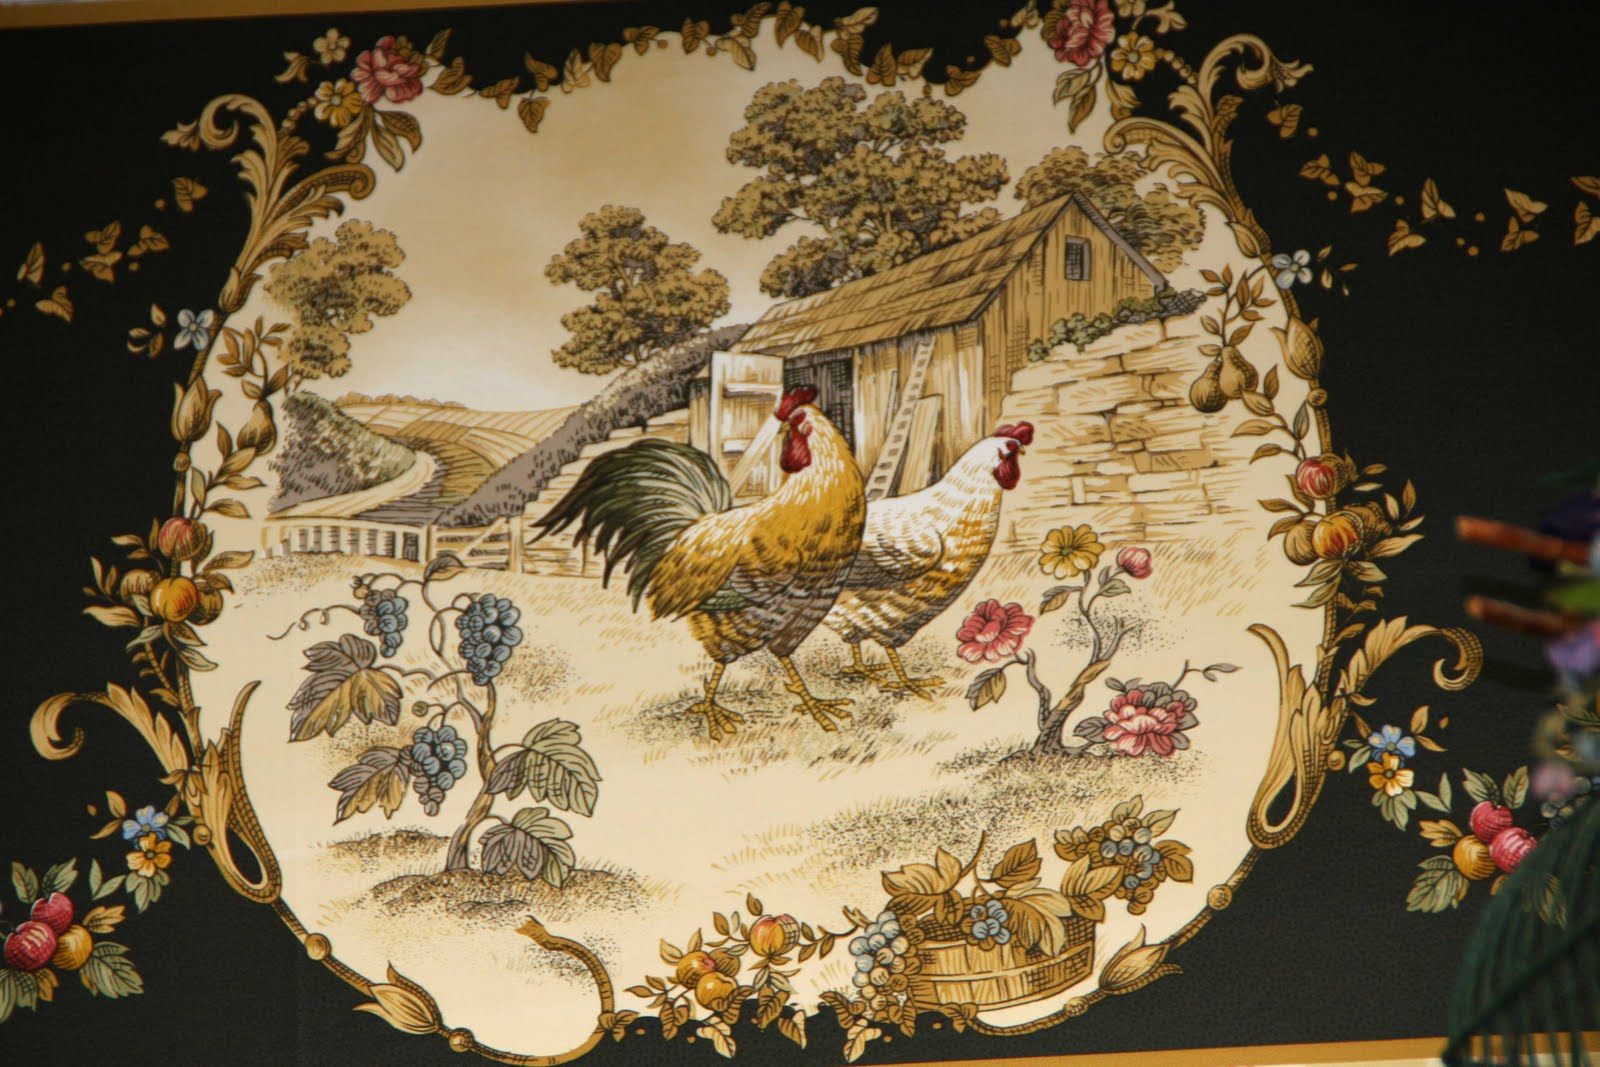 Chicken Wallpaper Border Download Wallpaper DaWallpaperz 1600x1067